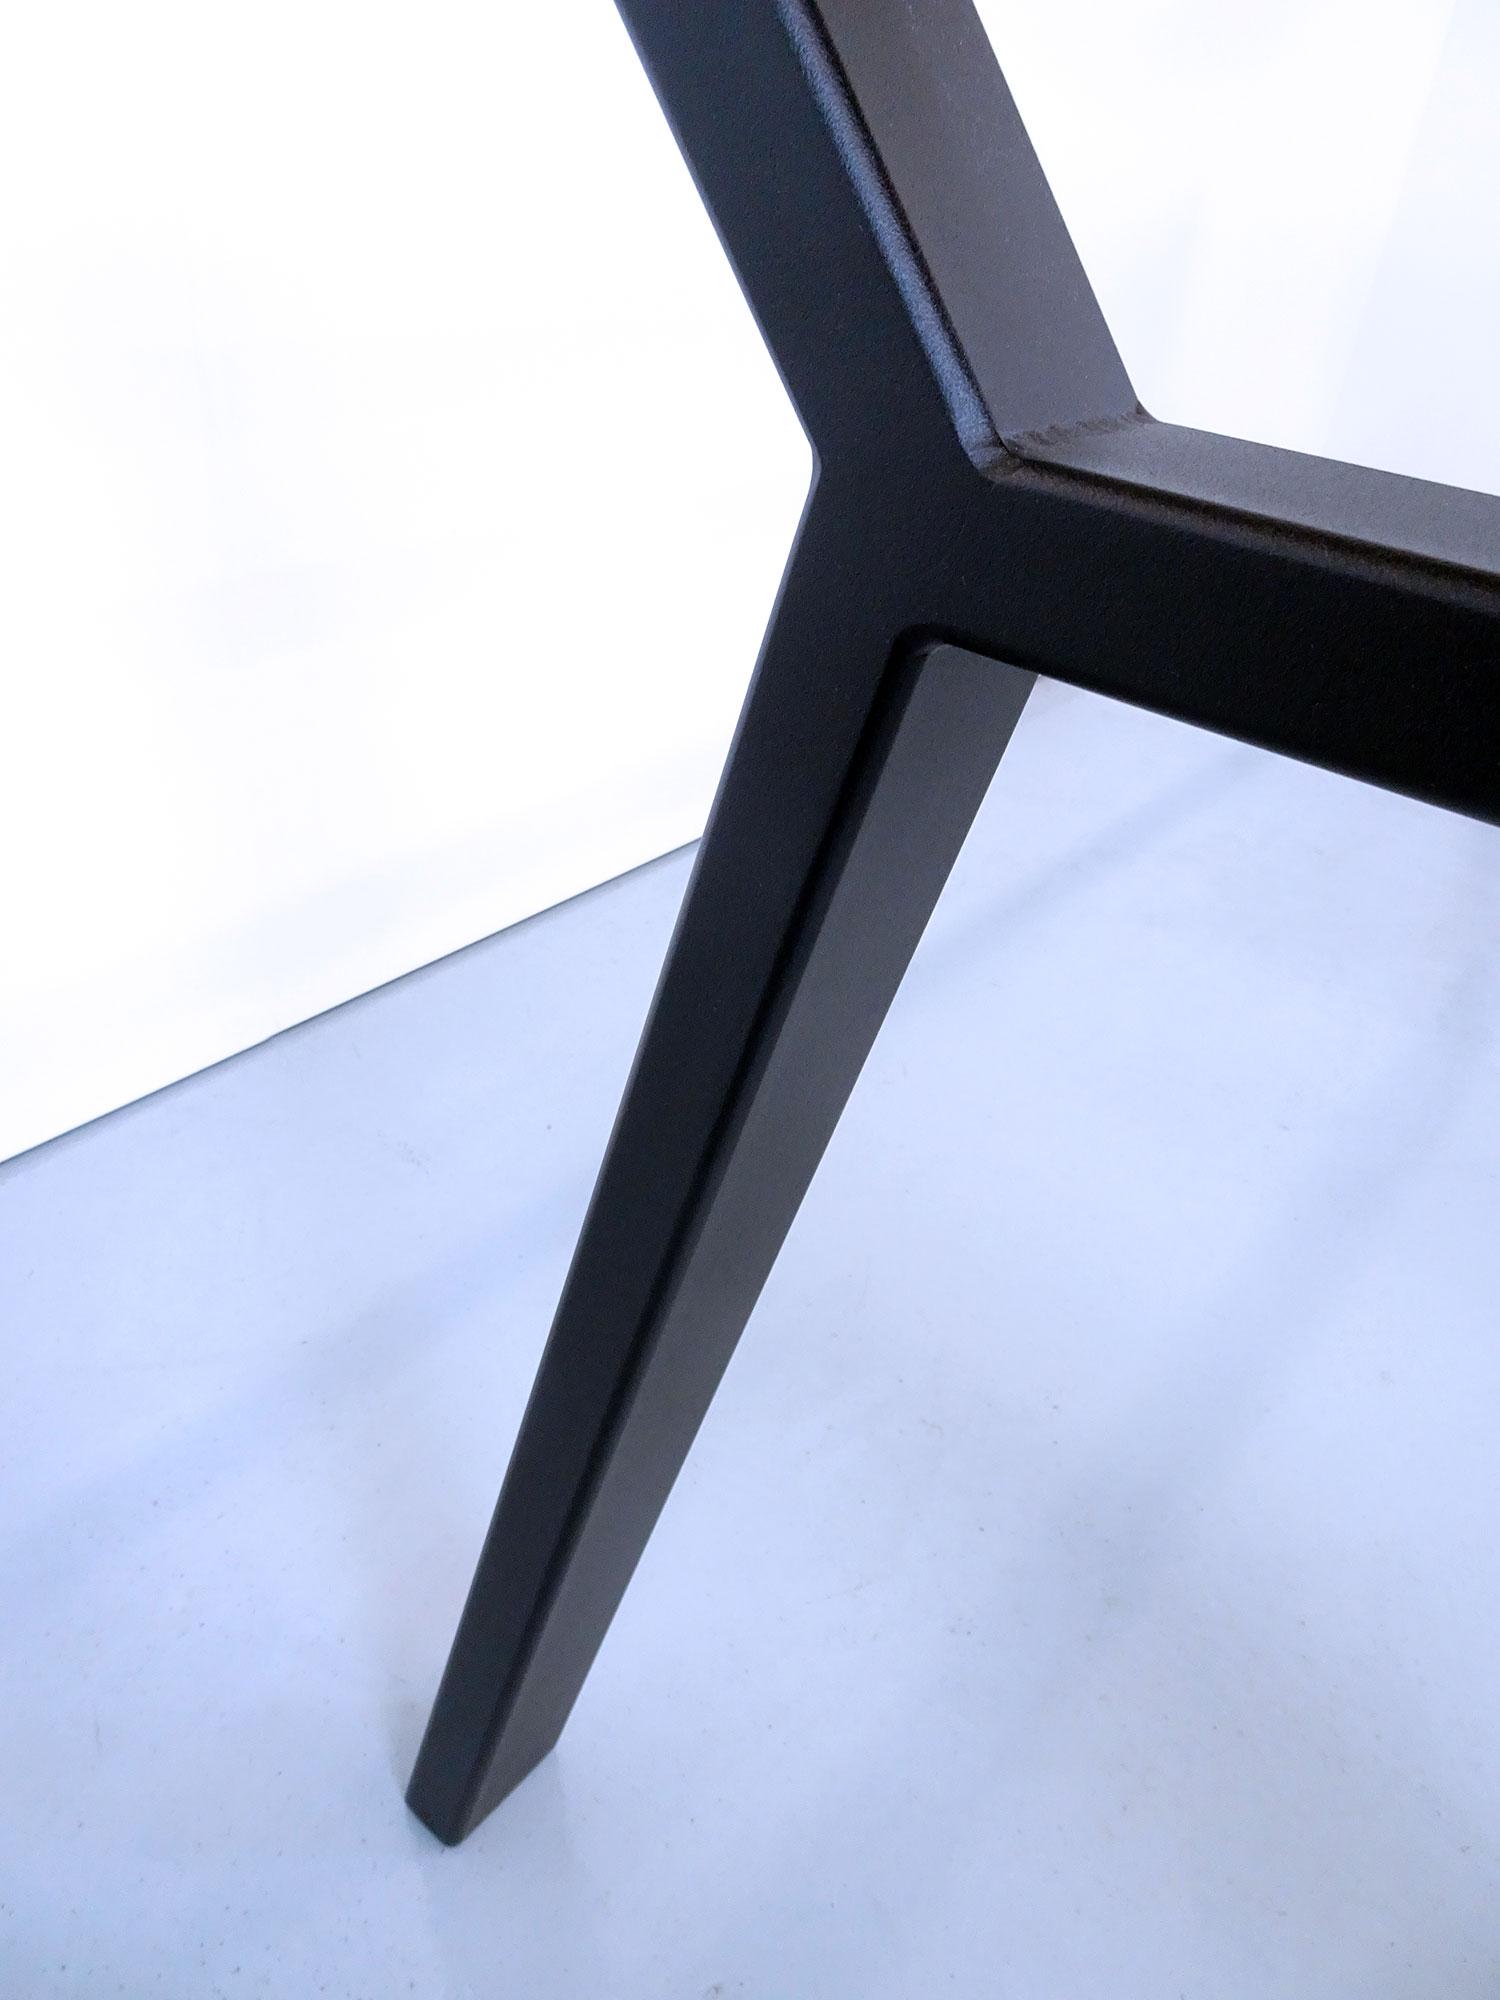 ARTMETA / Pied de table Hameau sur mesure en acier